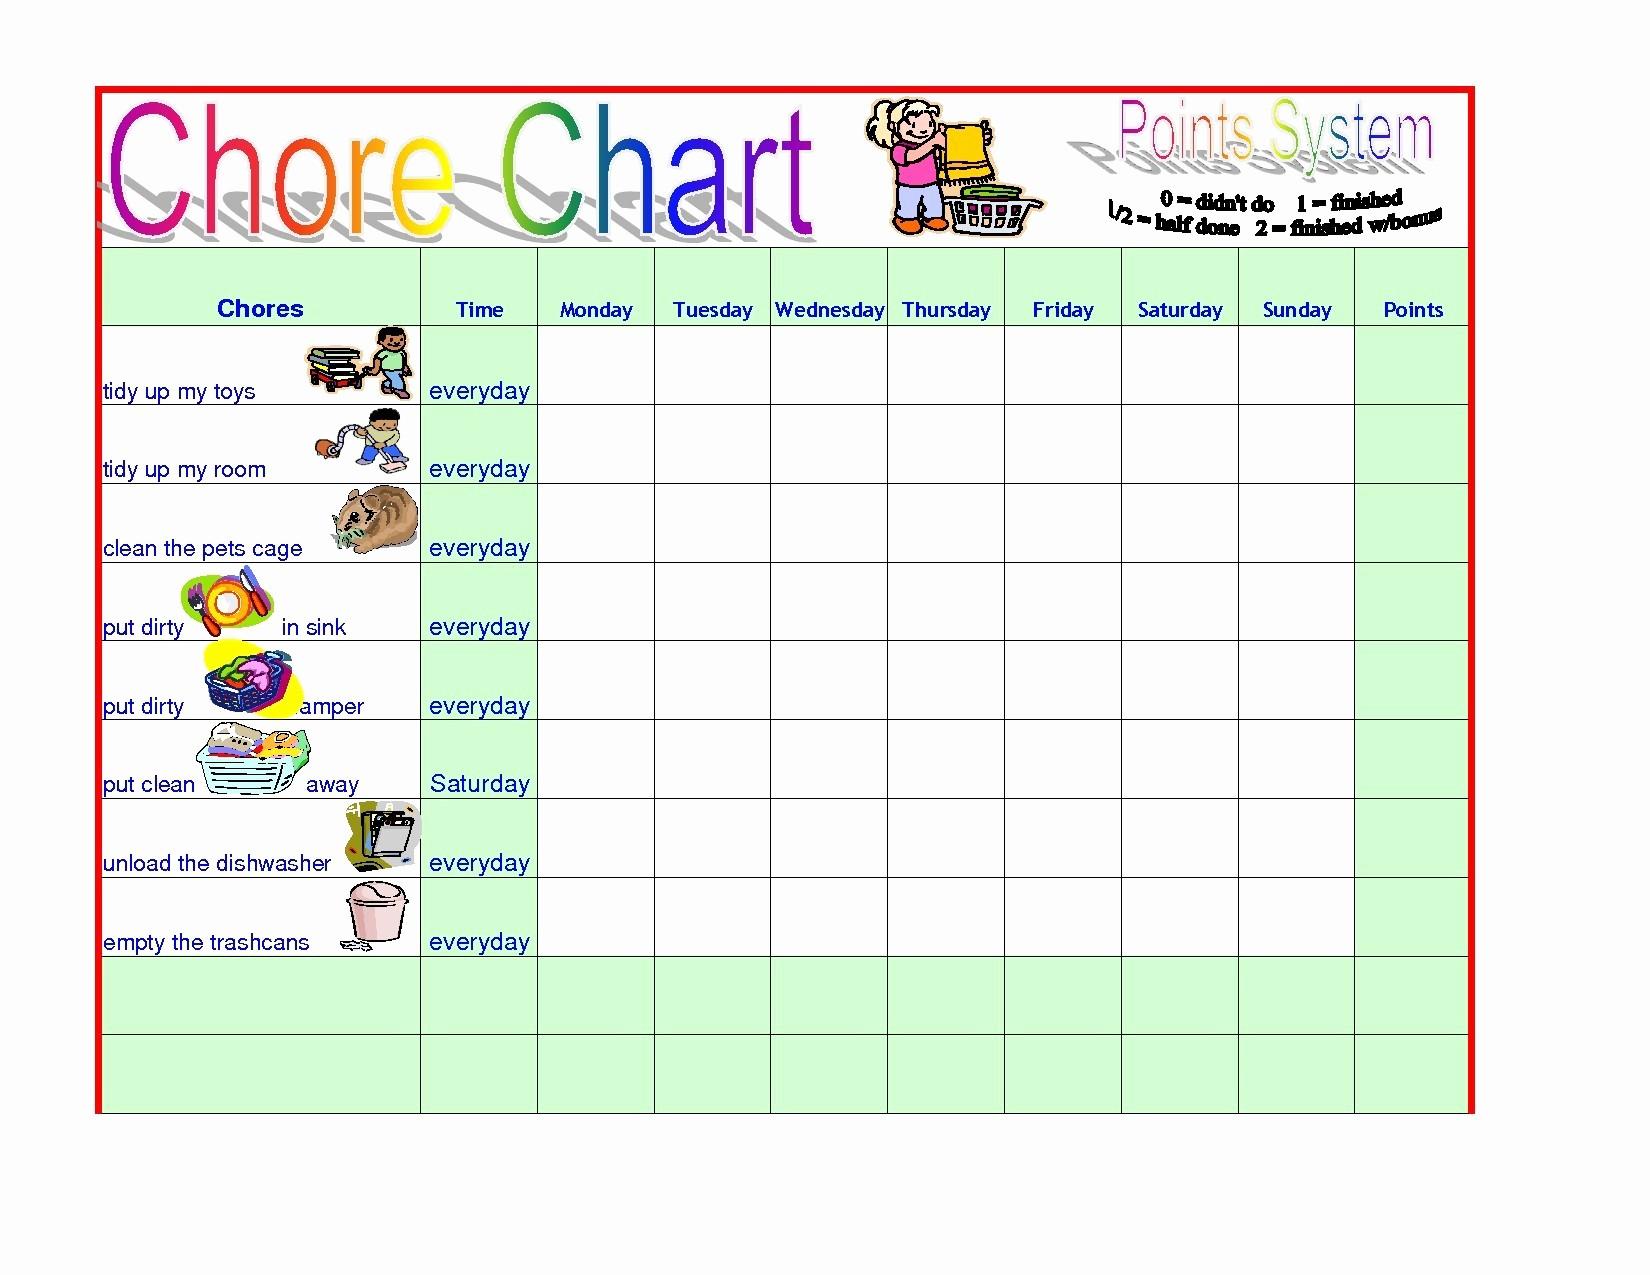 Chore List Template for Adults Unique Chore Chart Templates Save Chore Chart for Adults